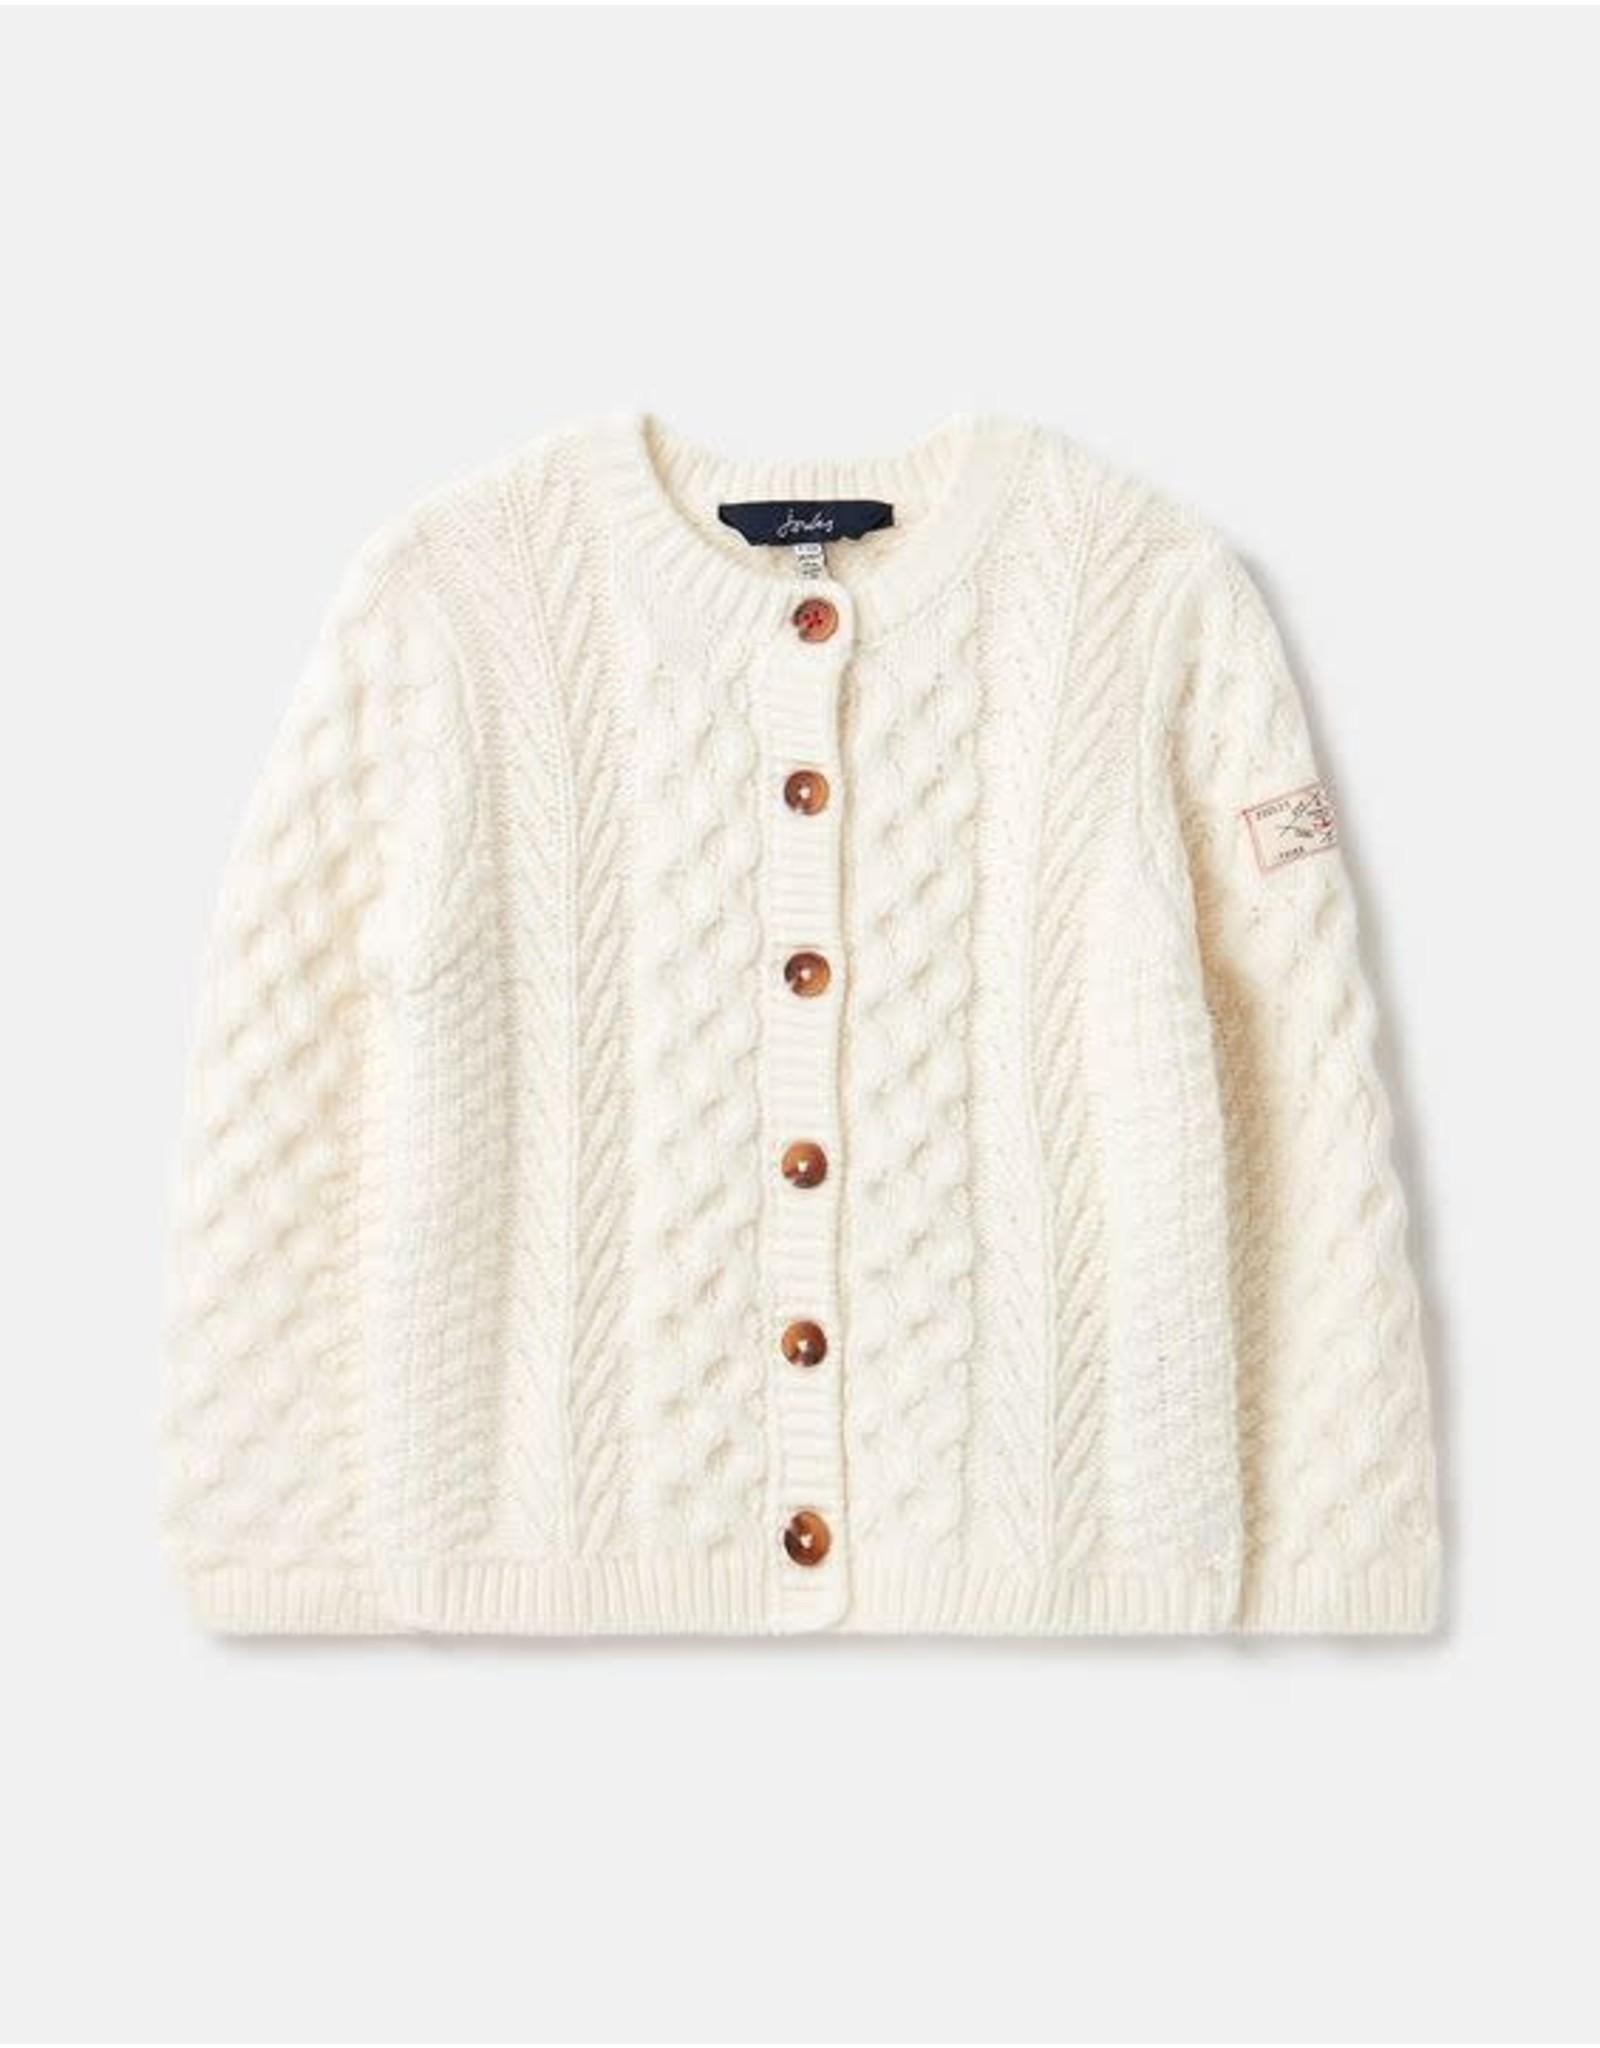 joules Joules Aran Knit Cardigan